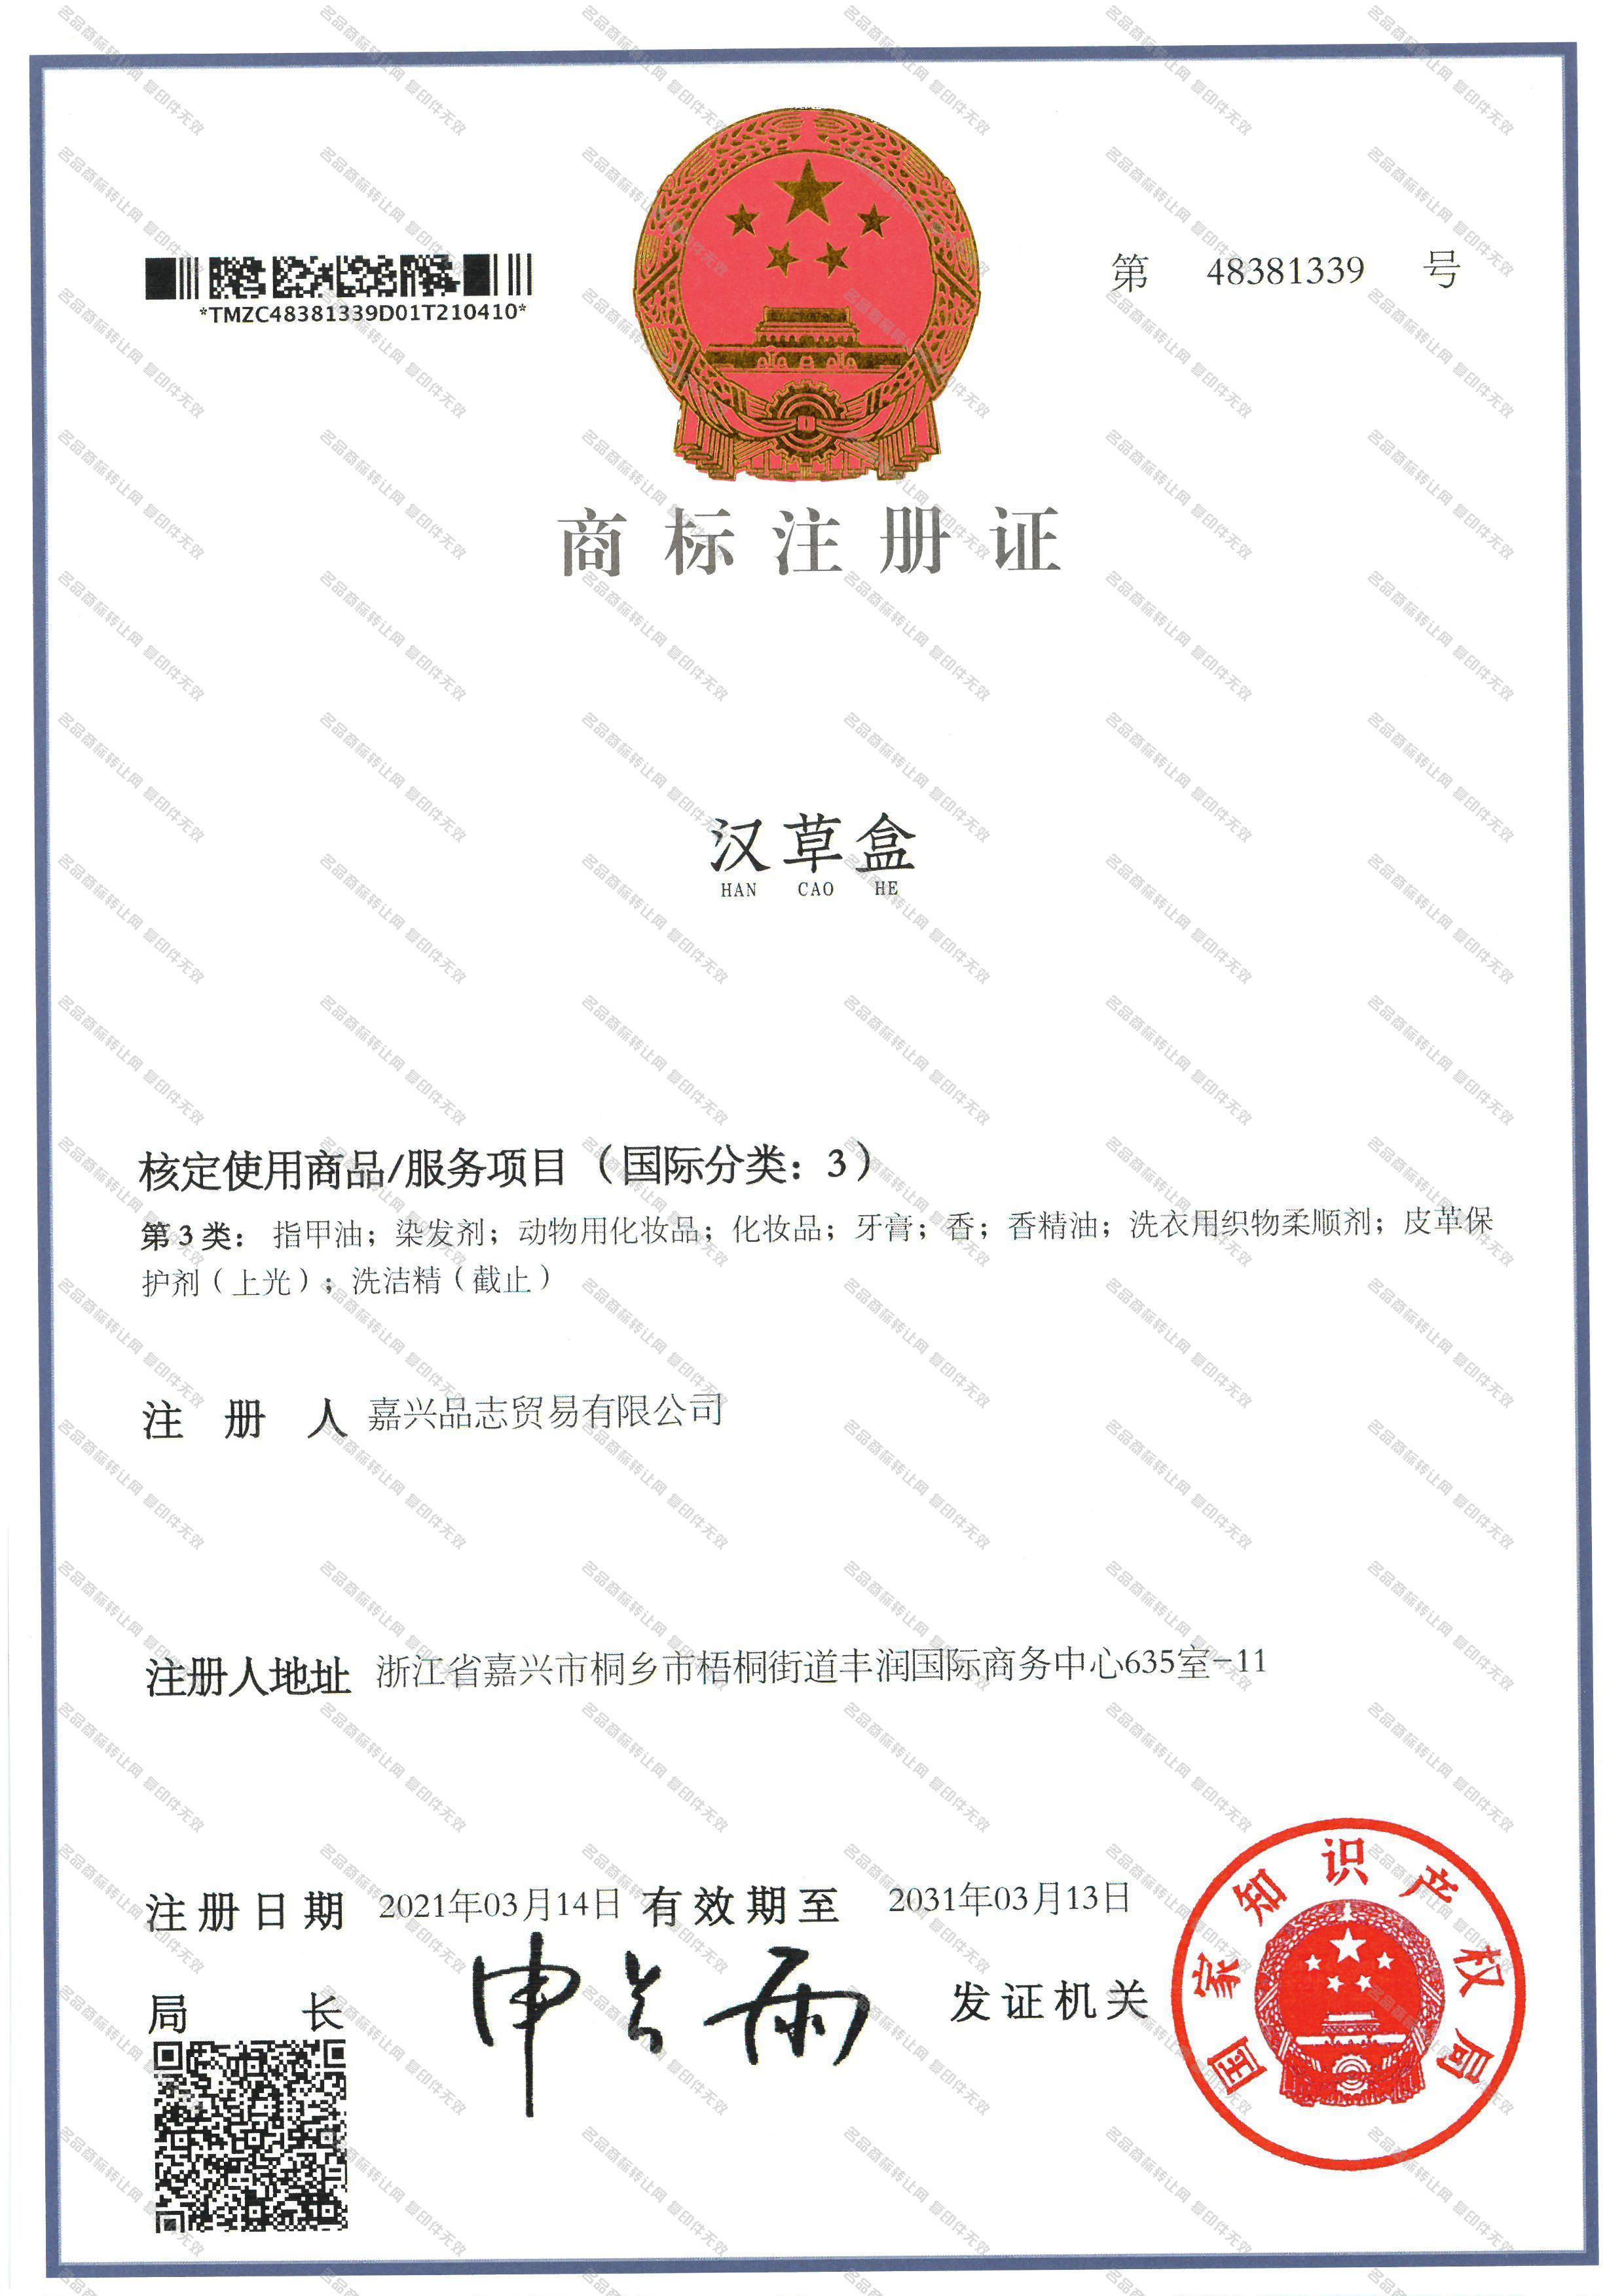 汉草盒;HANCAOHE注册证